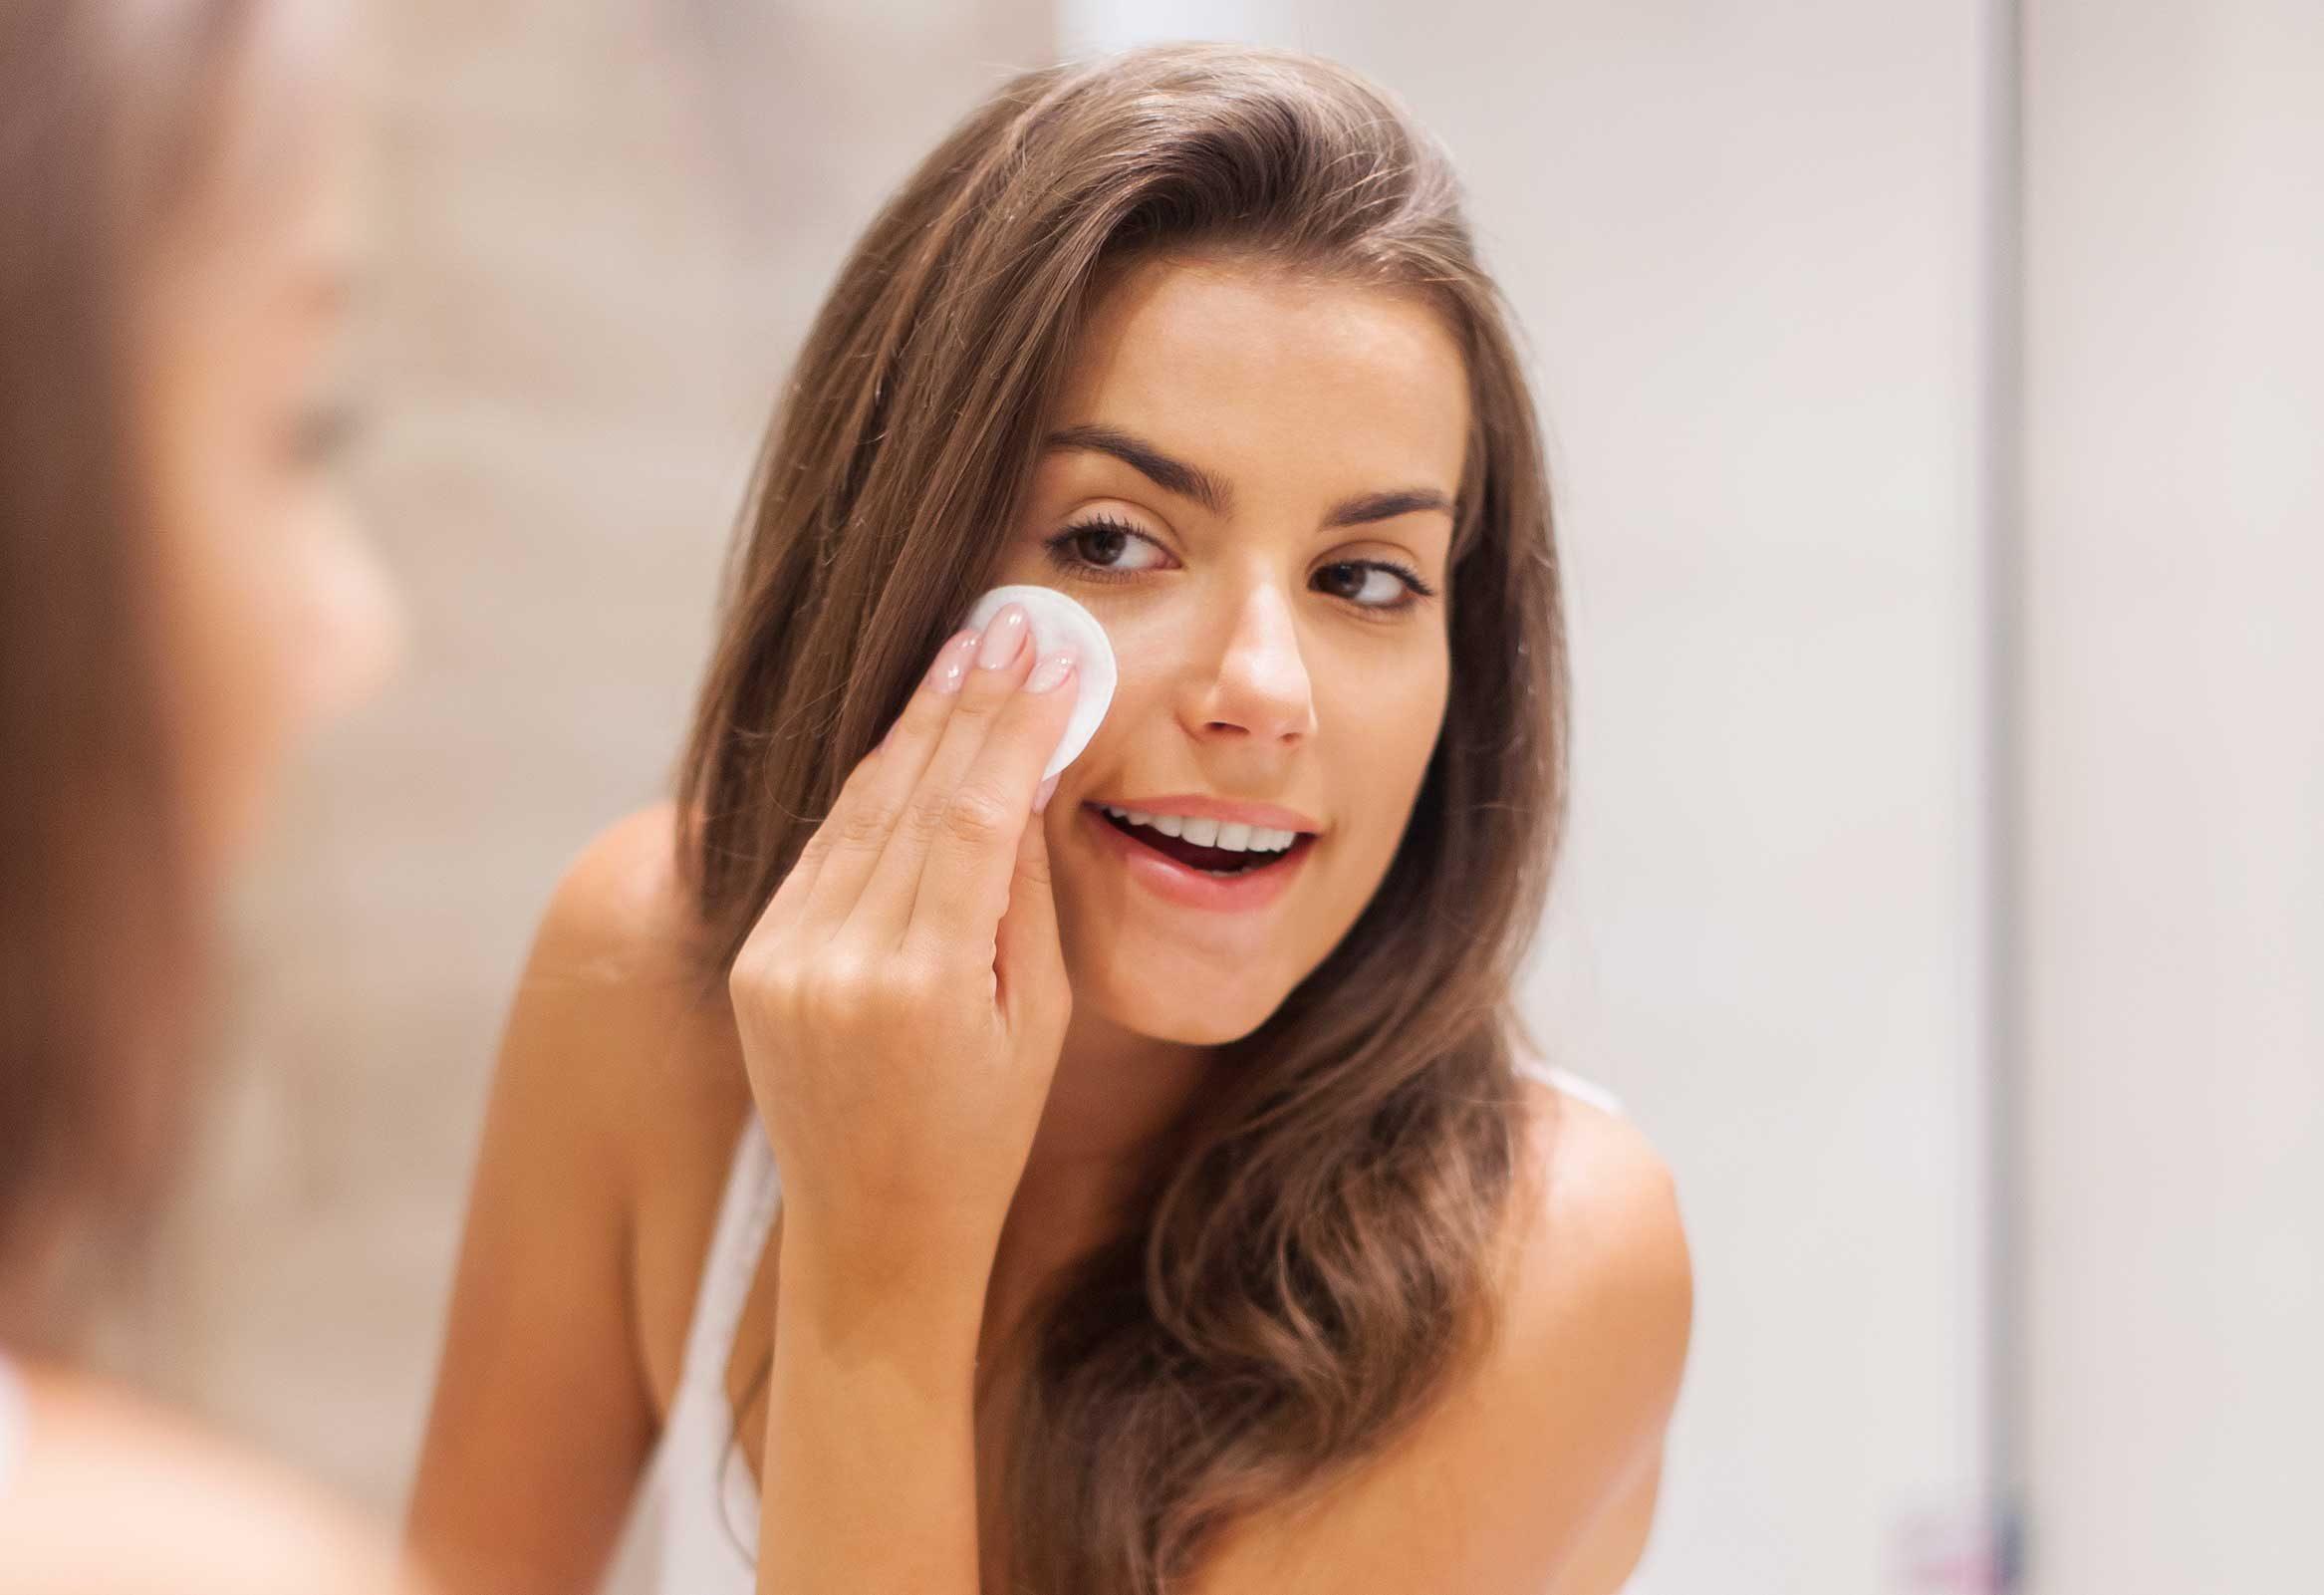 2. Don't redo makeup; refresh it